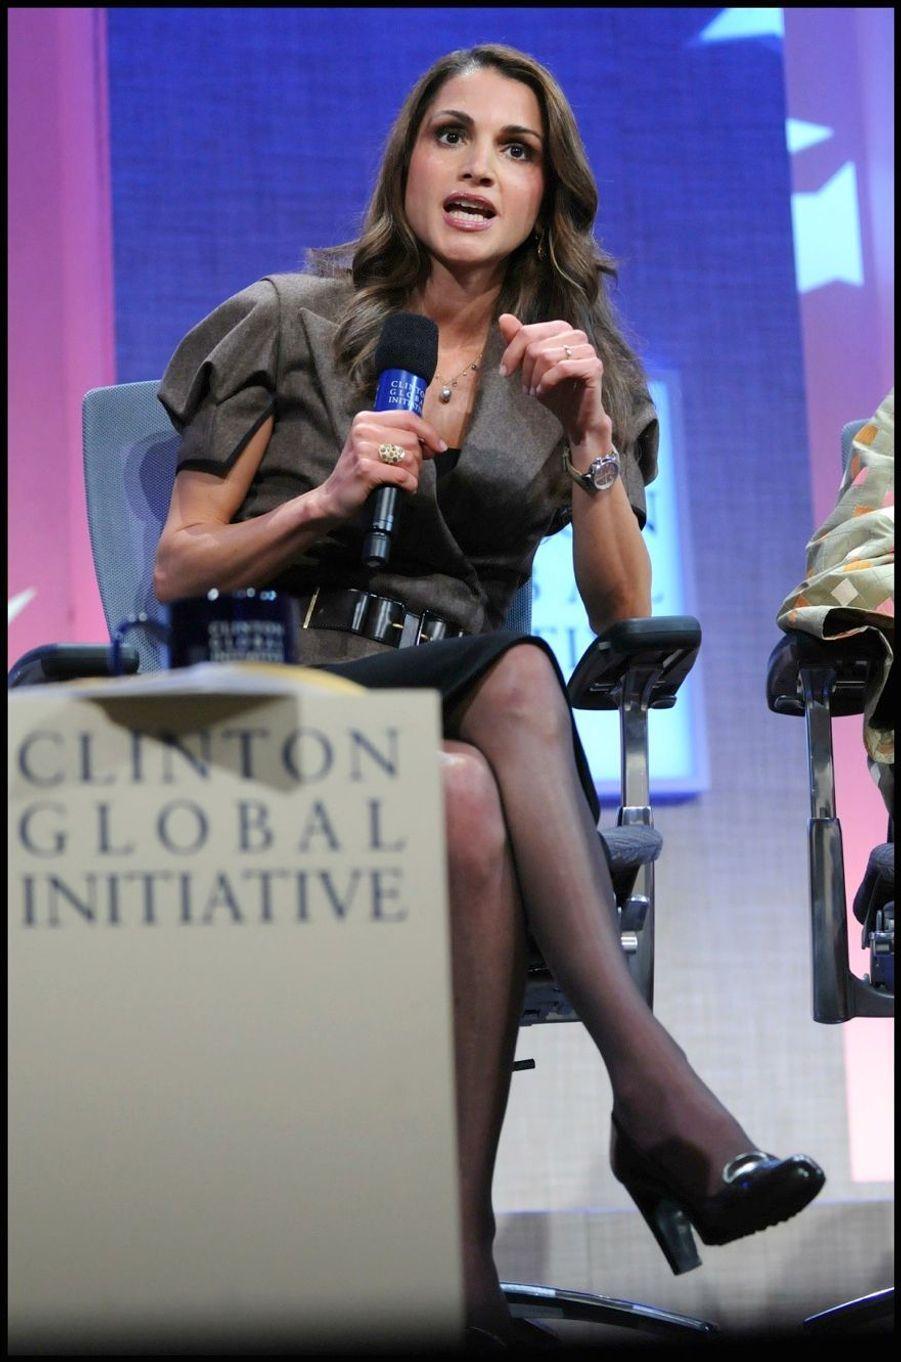 La reine Rania à la Clinton Global Initiative en 2008